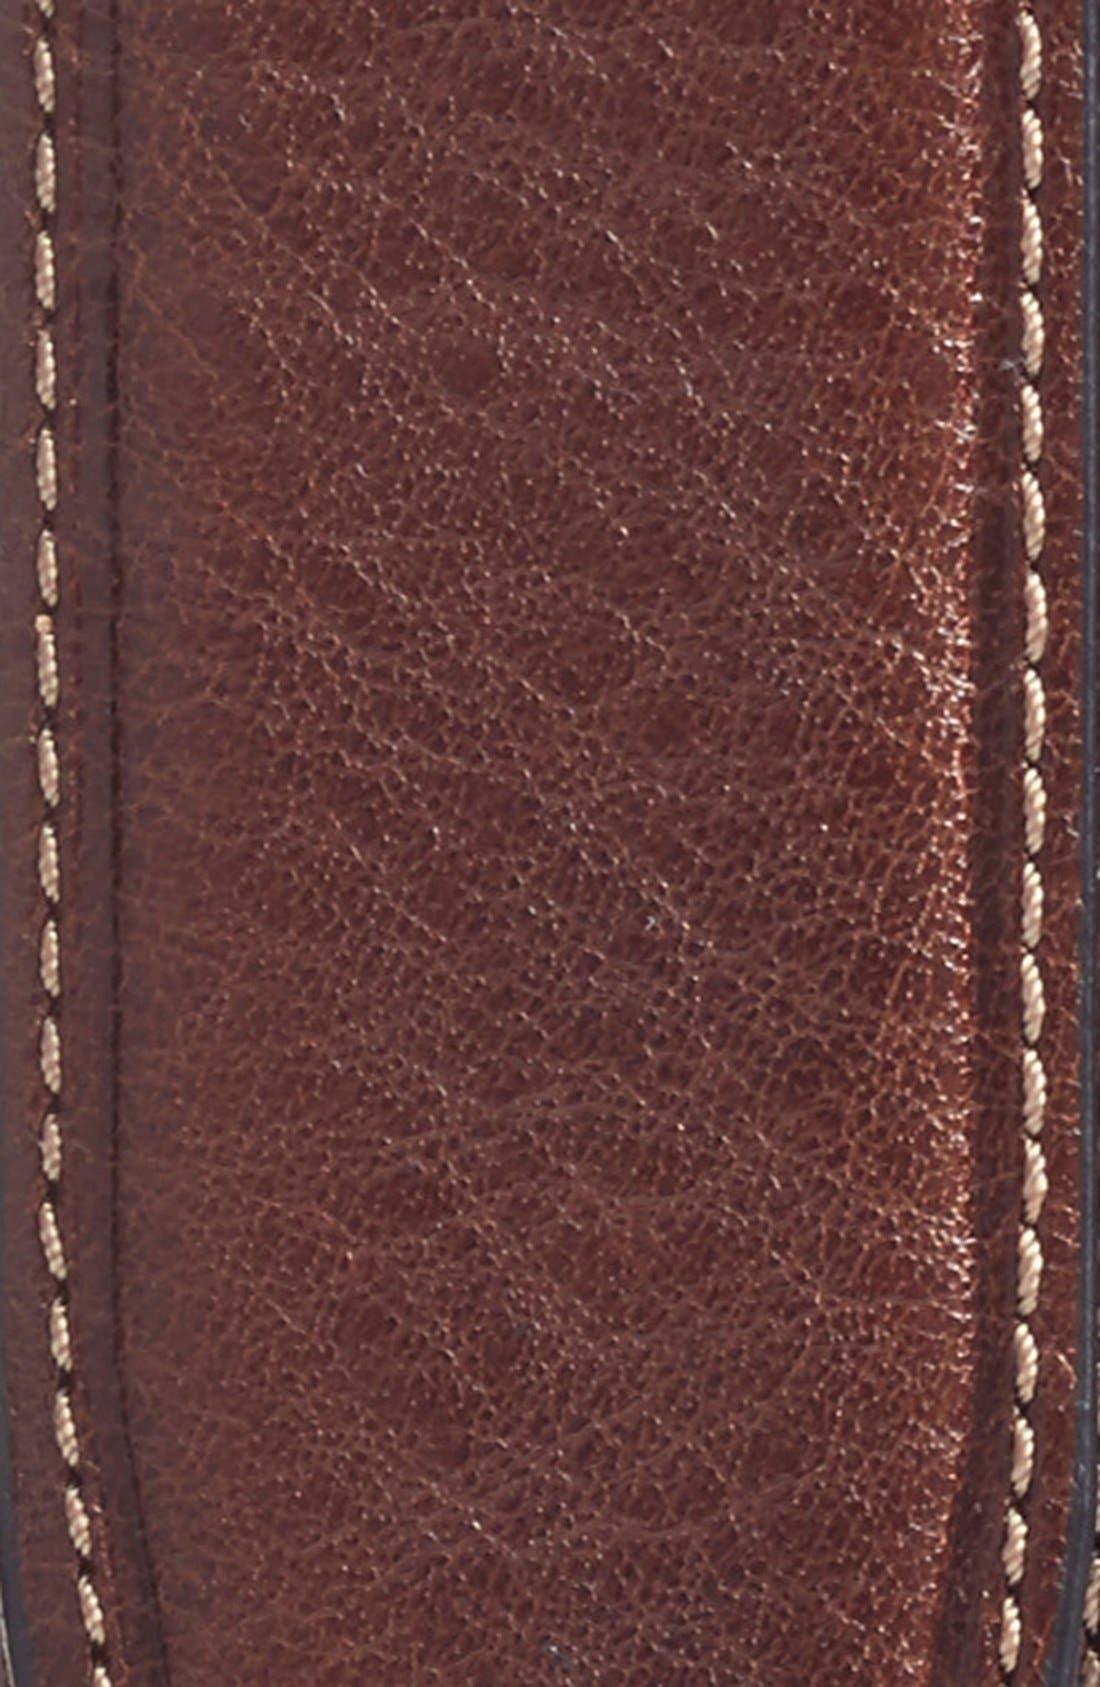 Reversible Leather Belt,                             Alternate thumbnail 2, color,